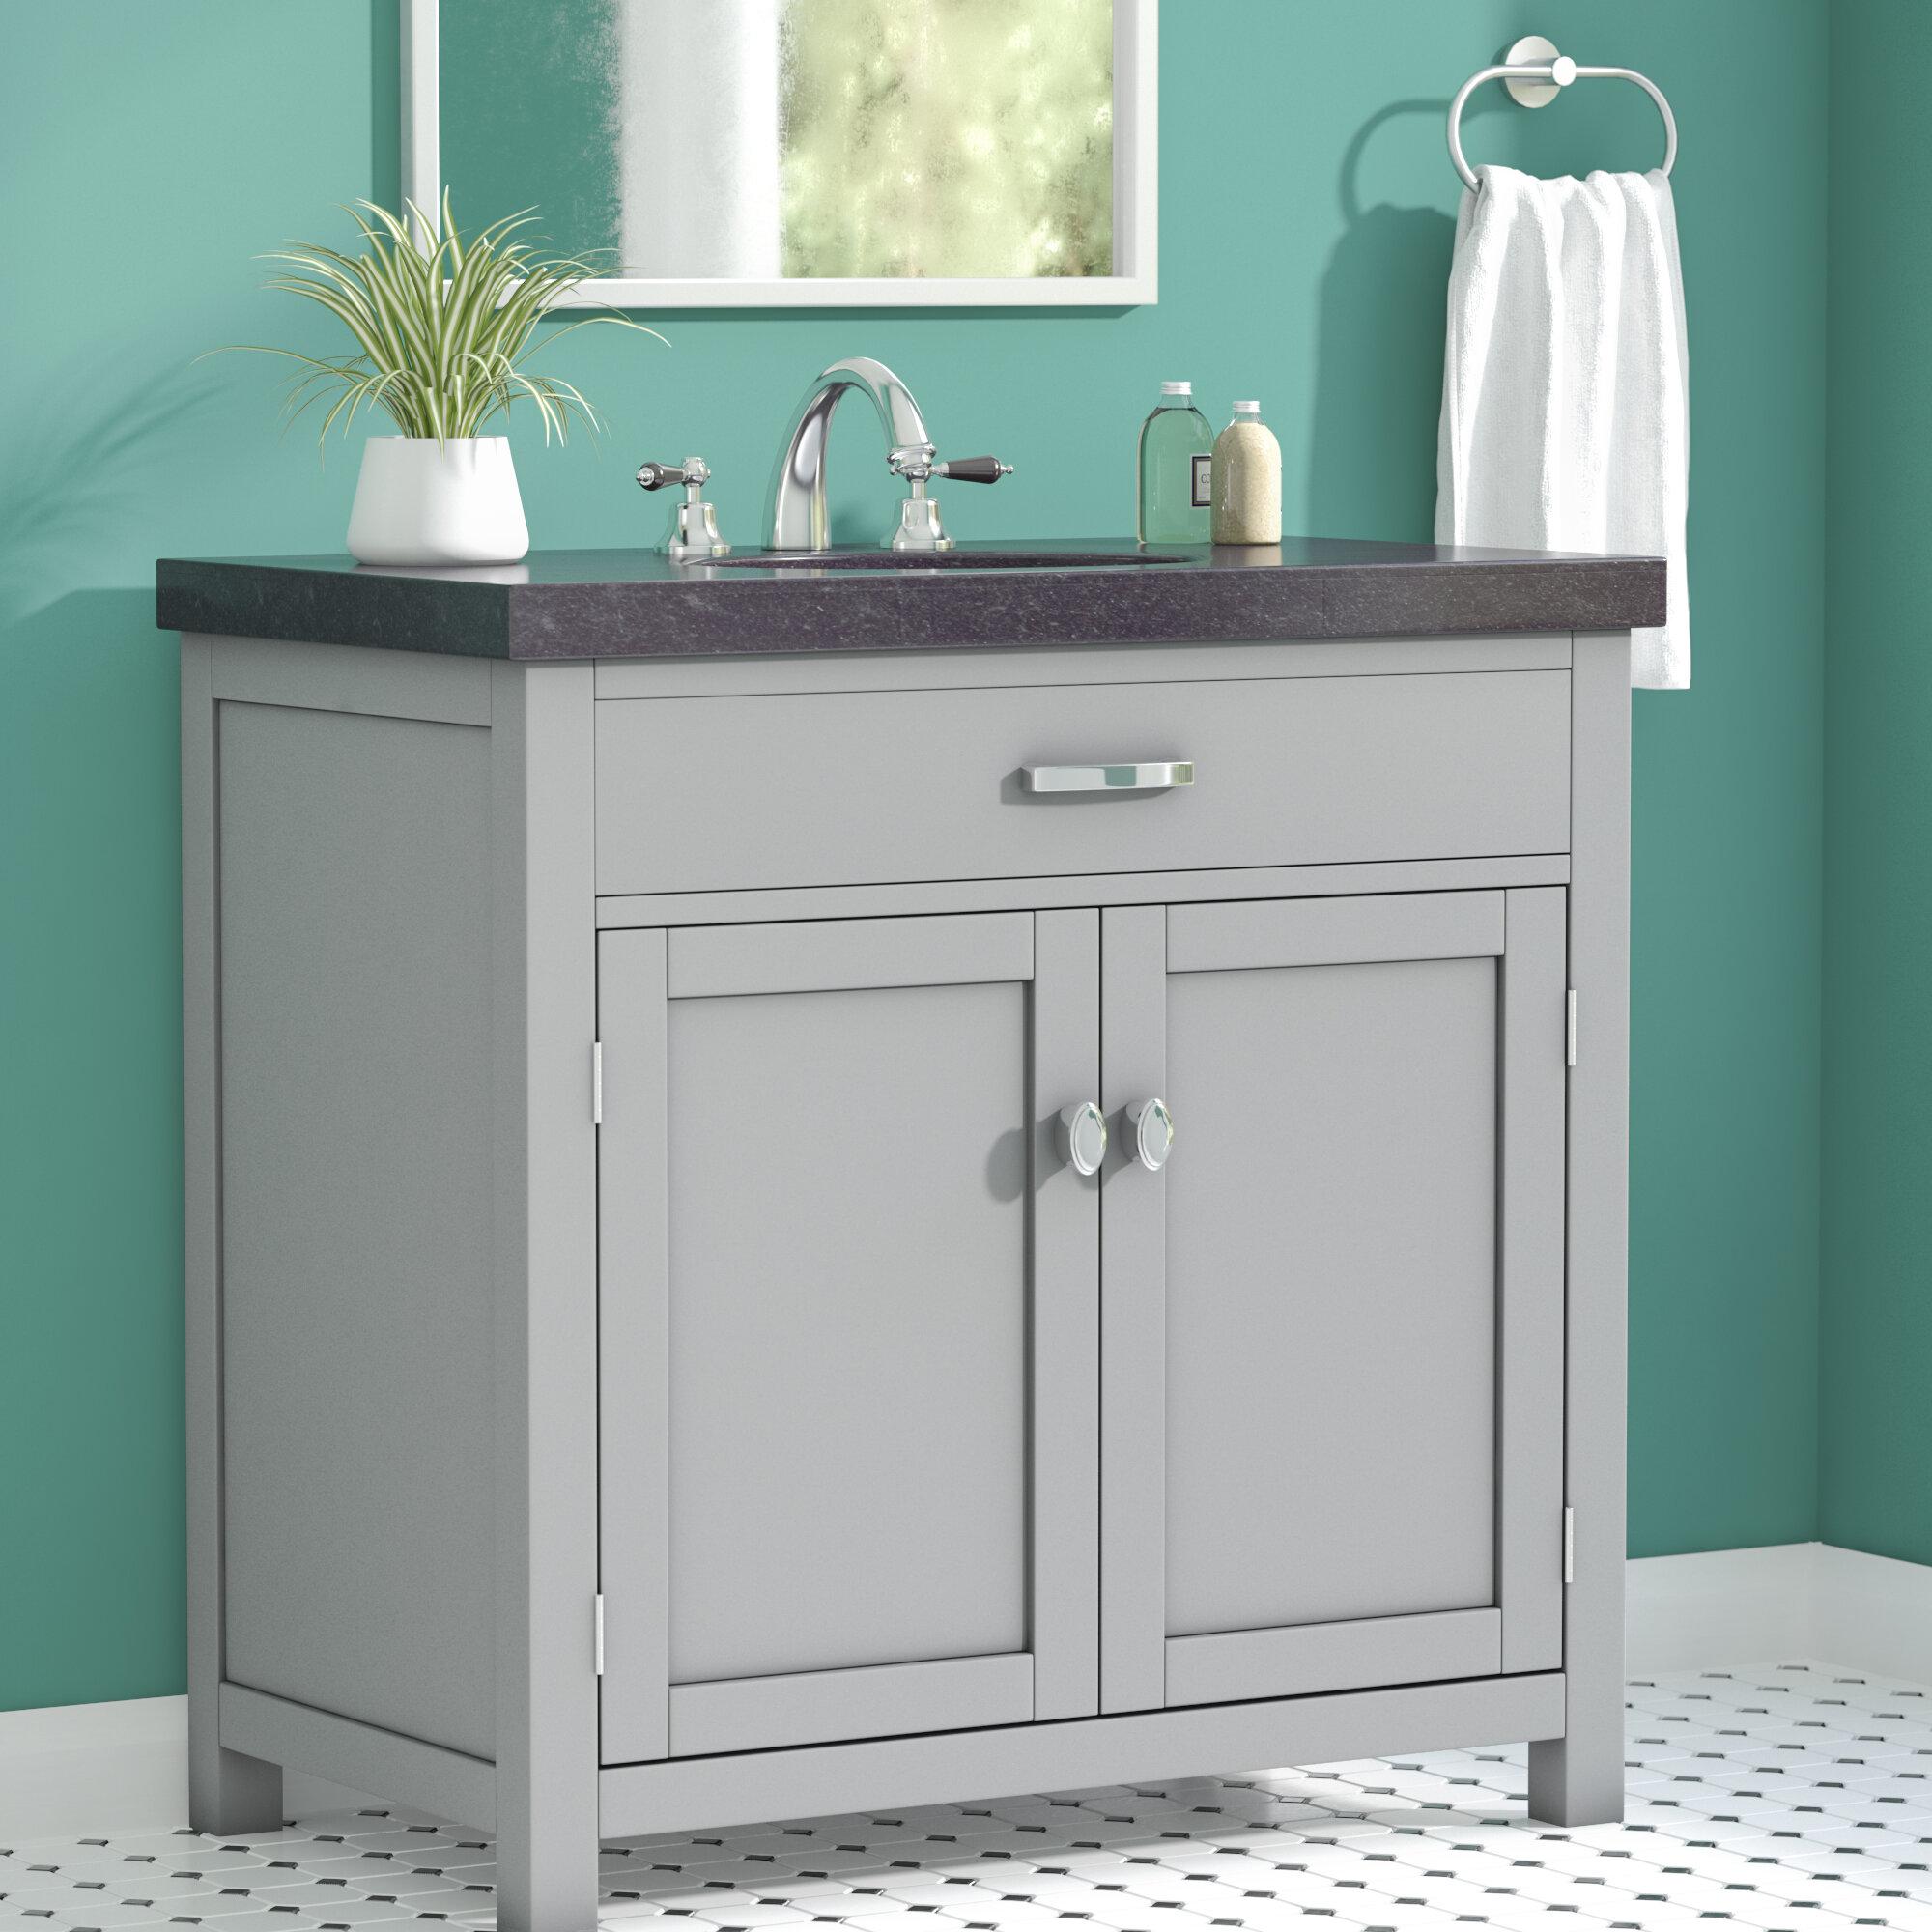 Zipcode Design Marielle 35 Single Bathroom Vanity Set Reviews Wayfair